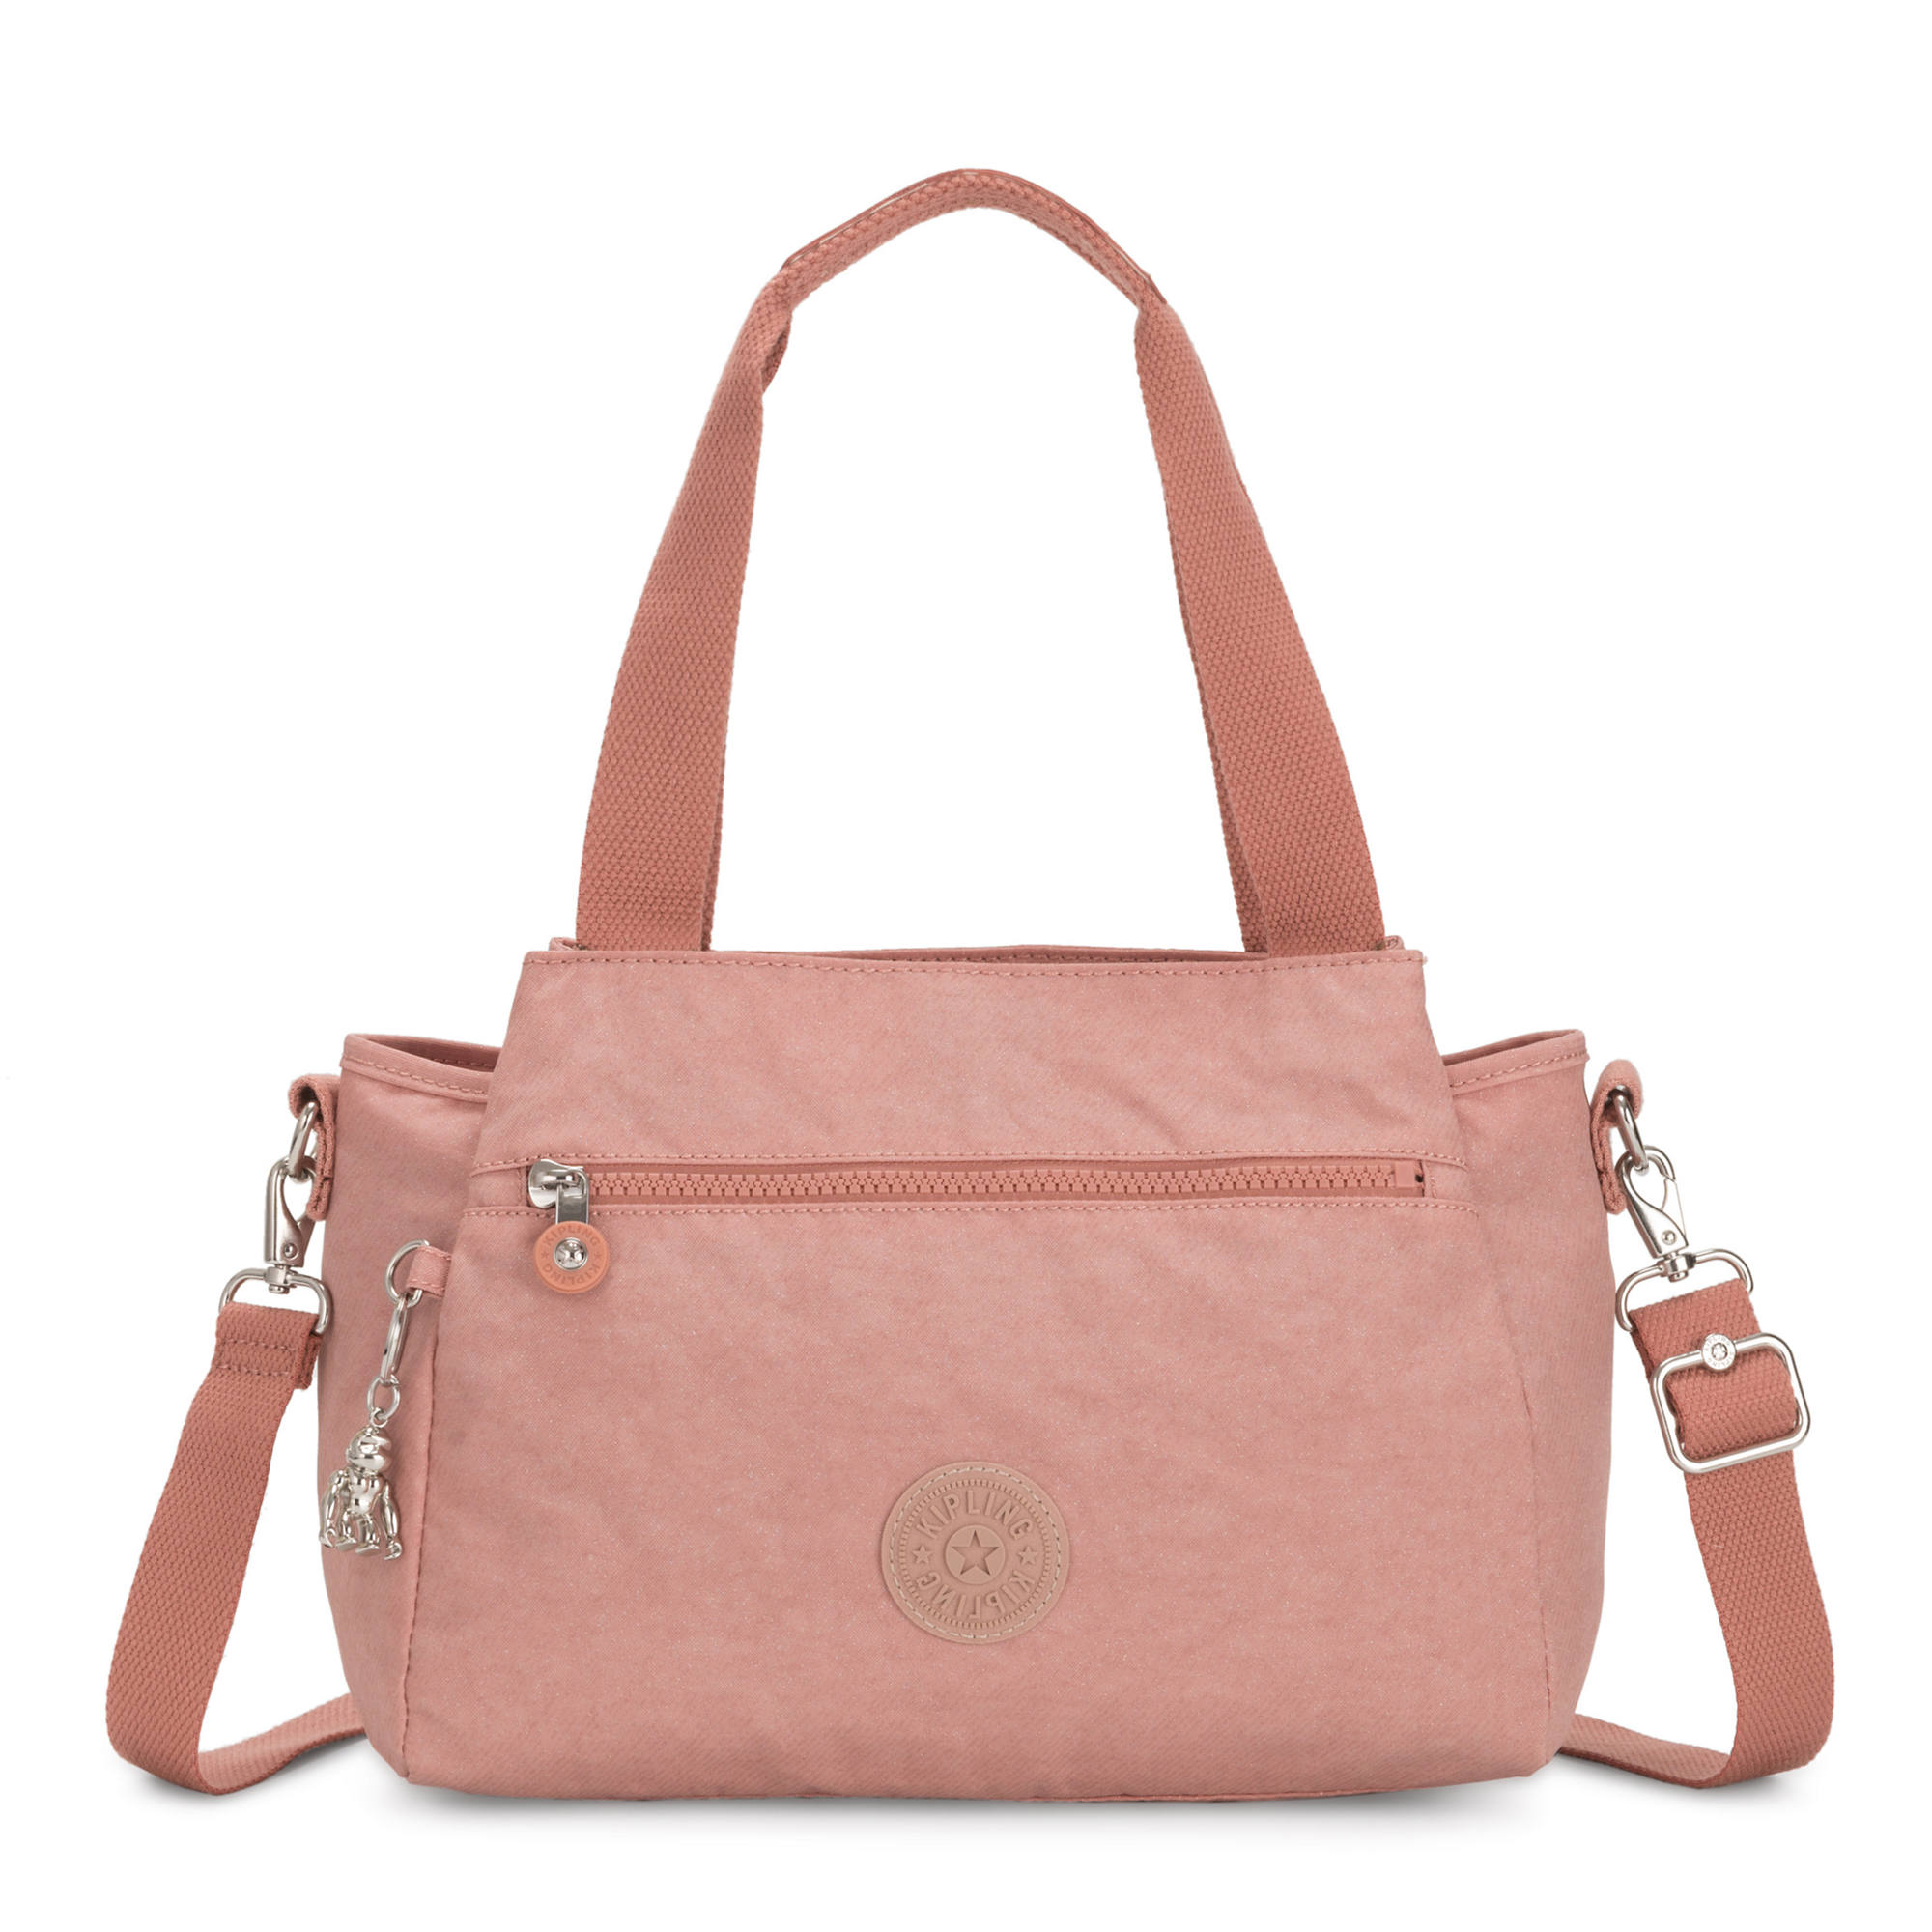 Elysia Handbag,Glimmer Pink,large-zoomed